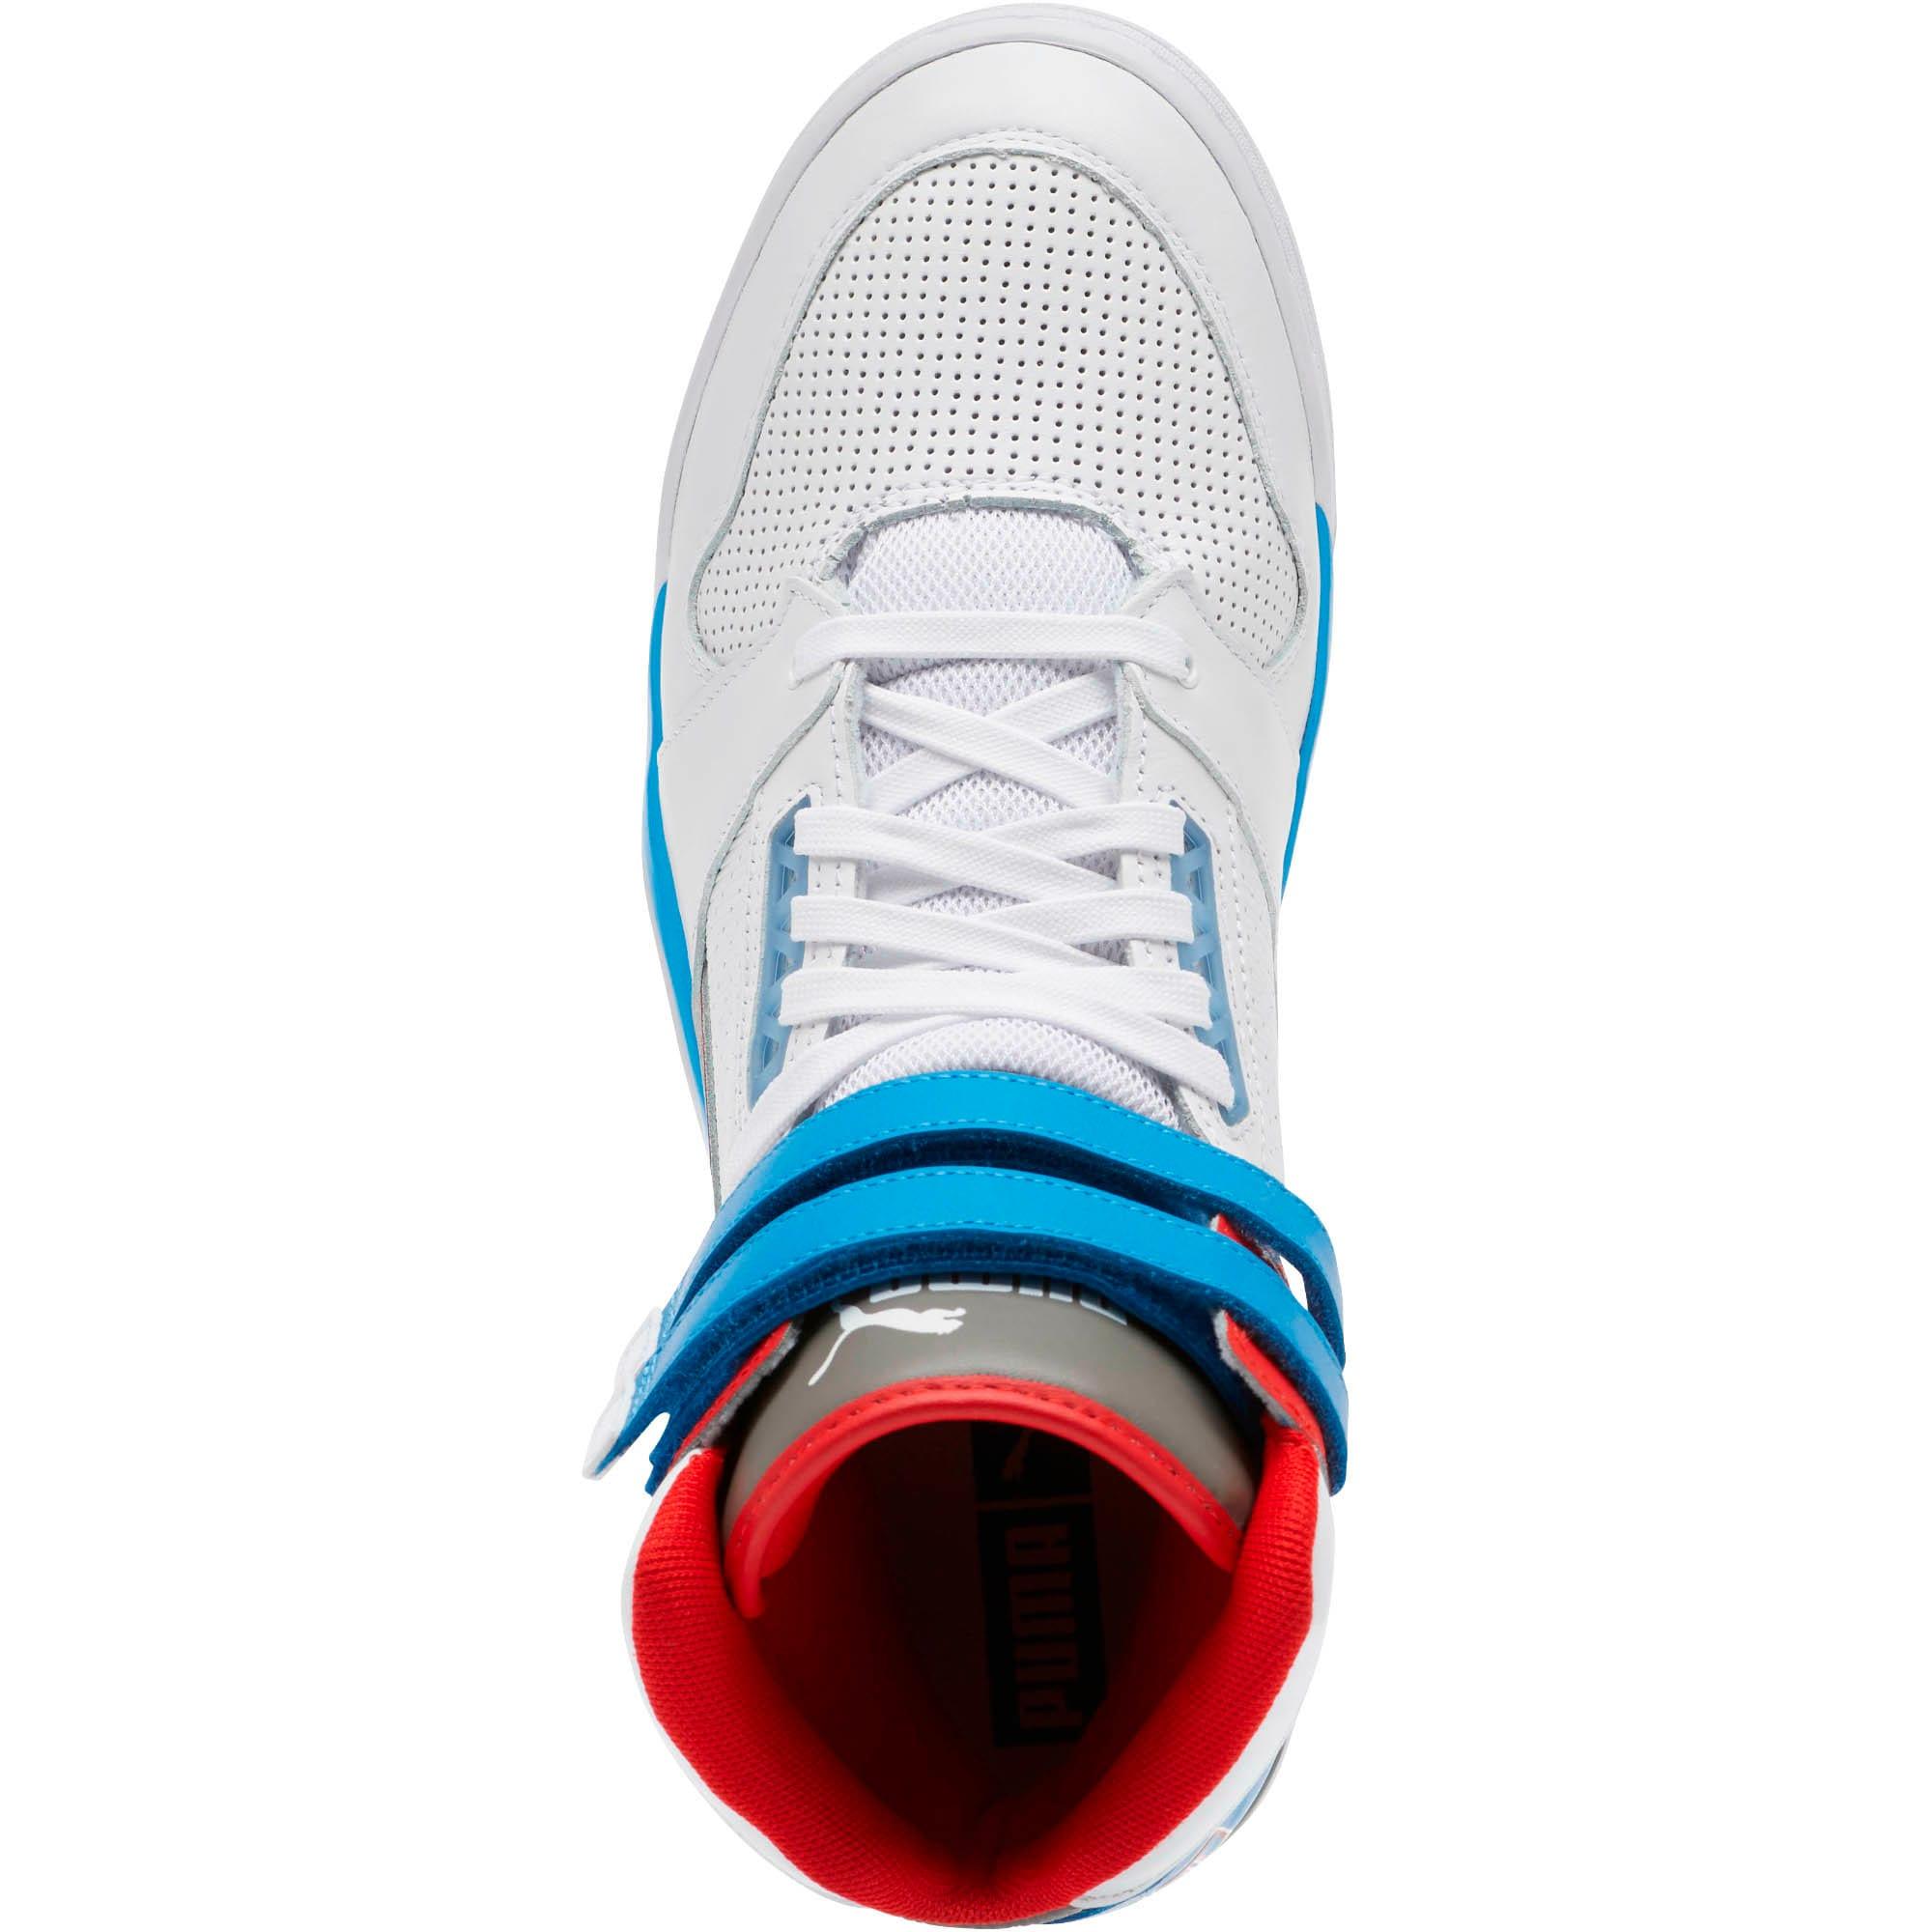 Thumbnail 5 of Palace Guard Mid Retro Sneakers, White-Indigo Bunting-Red, medium